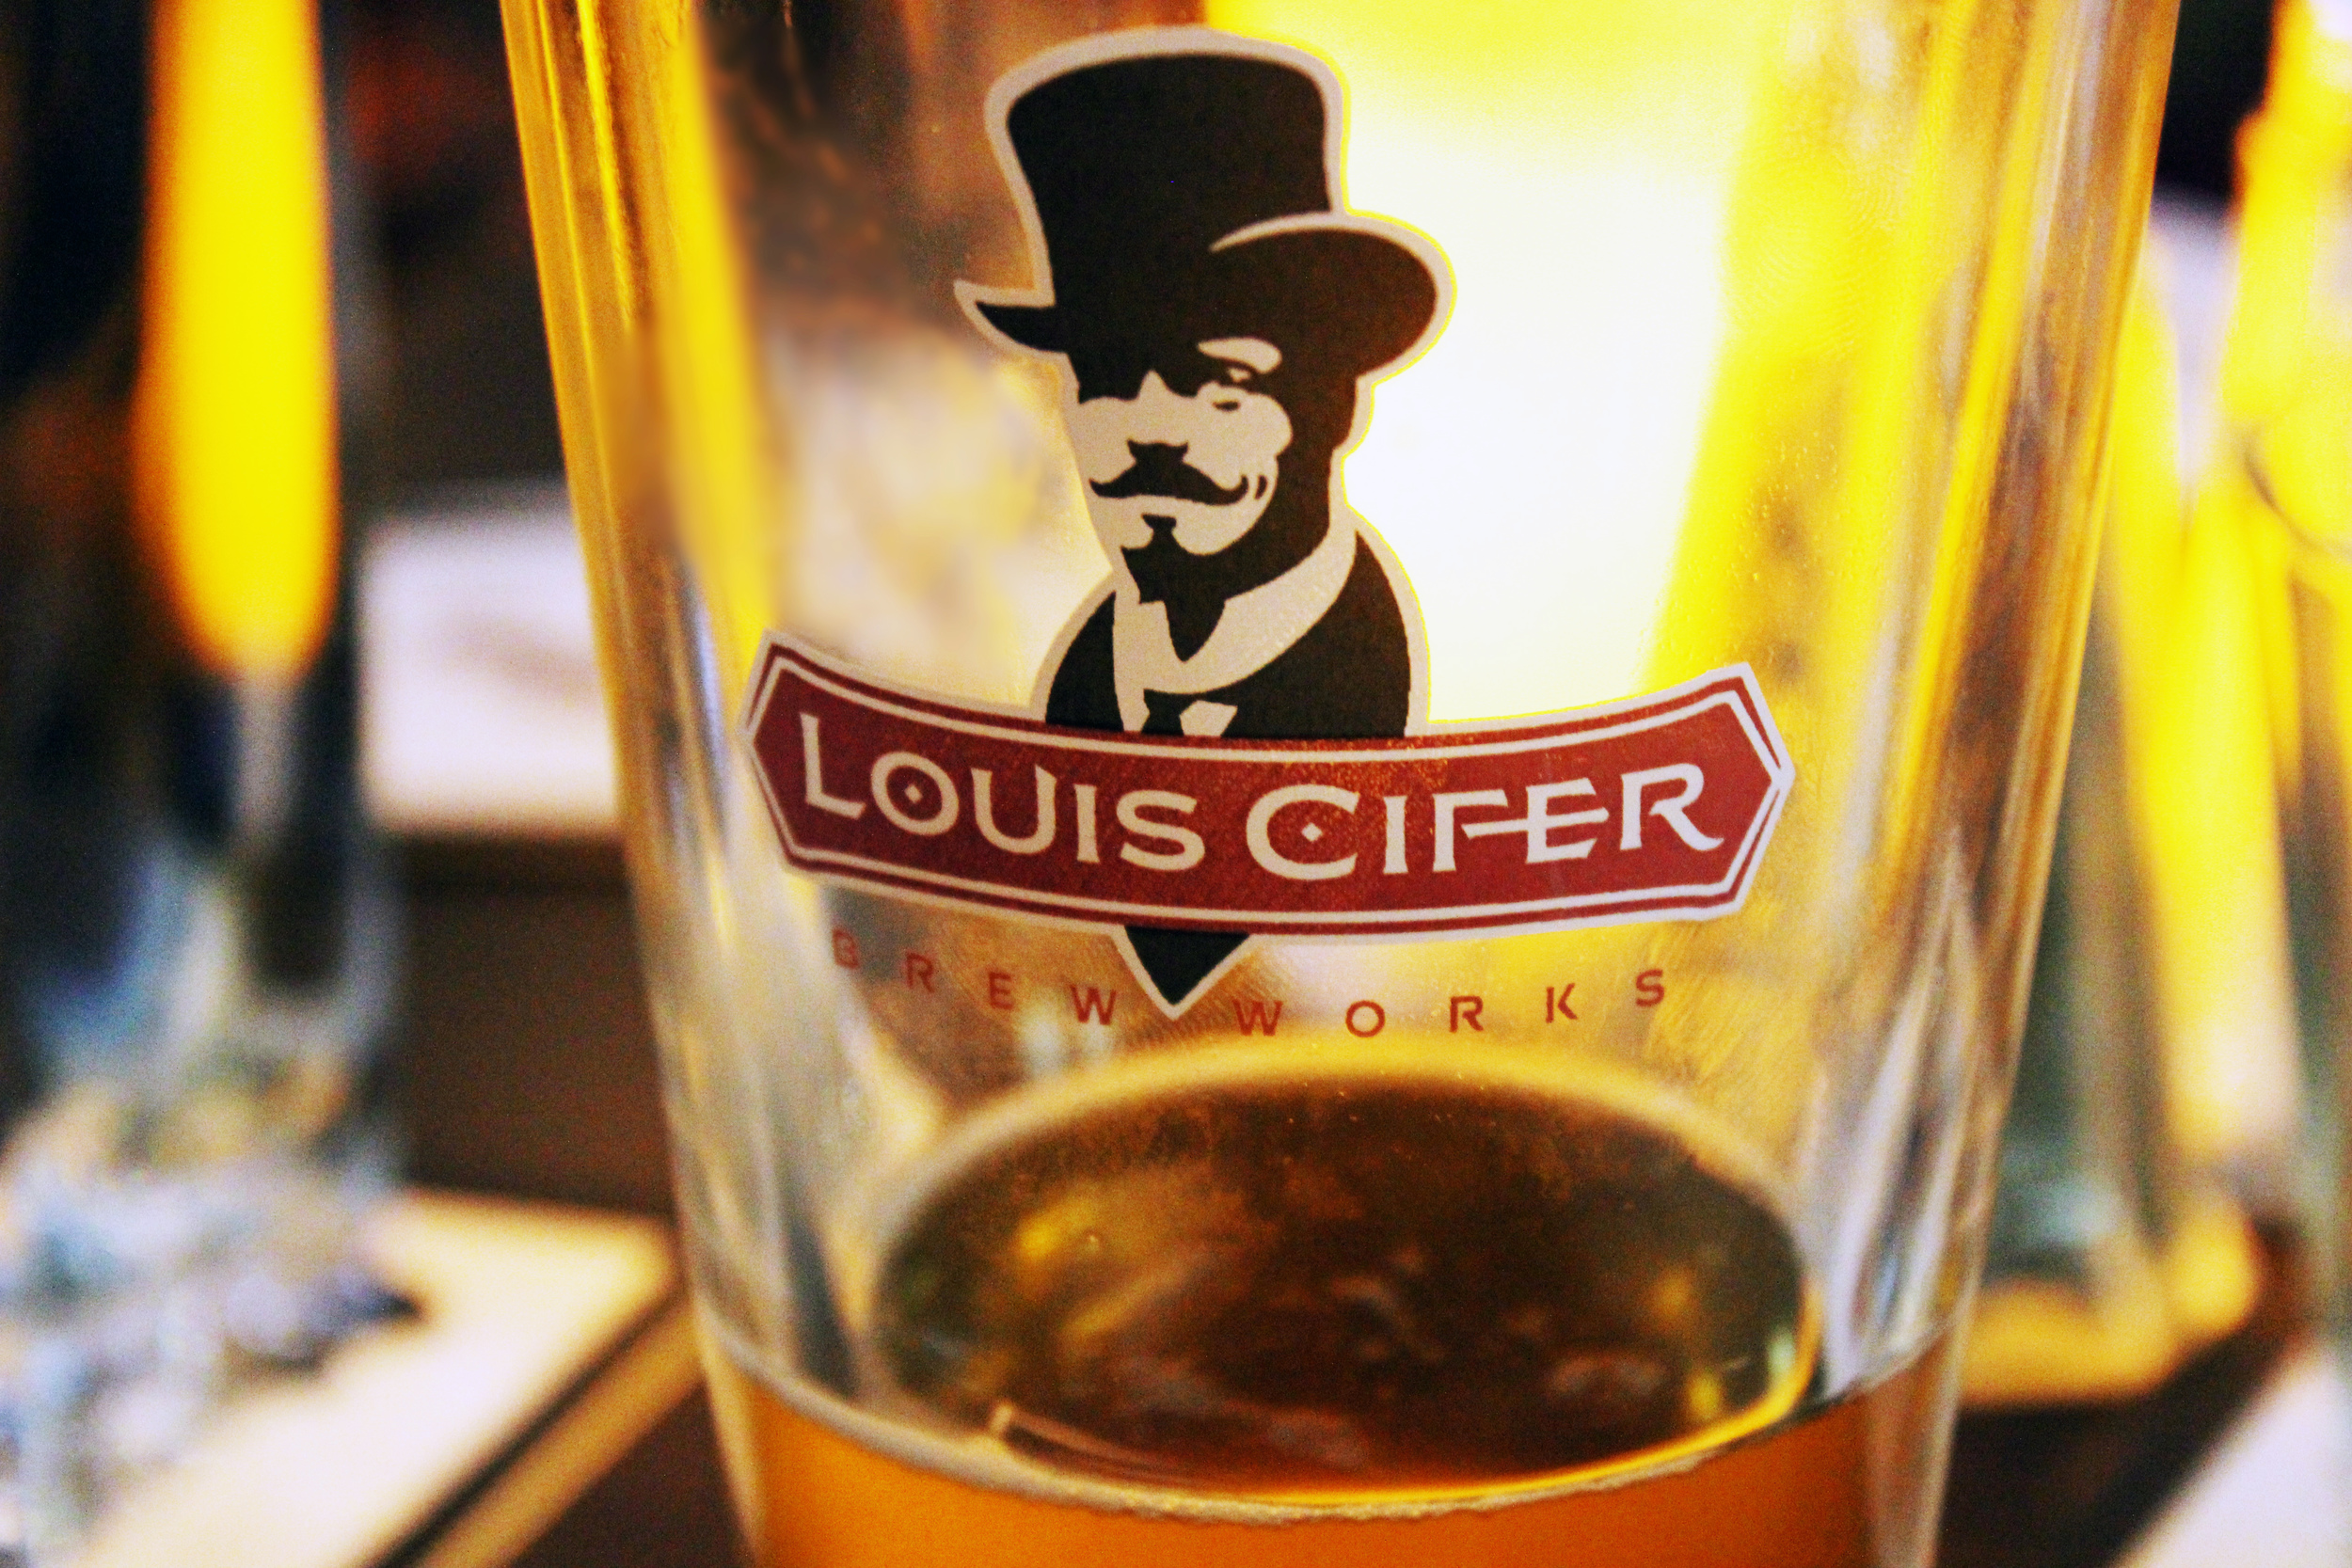 louis-cifer-half-pint-glass.jpg